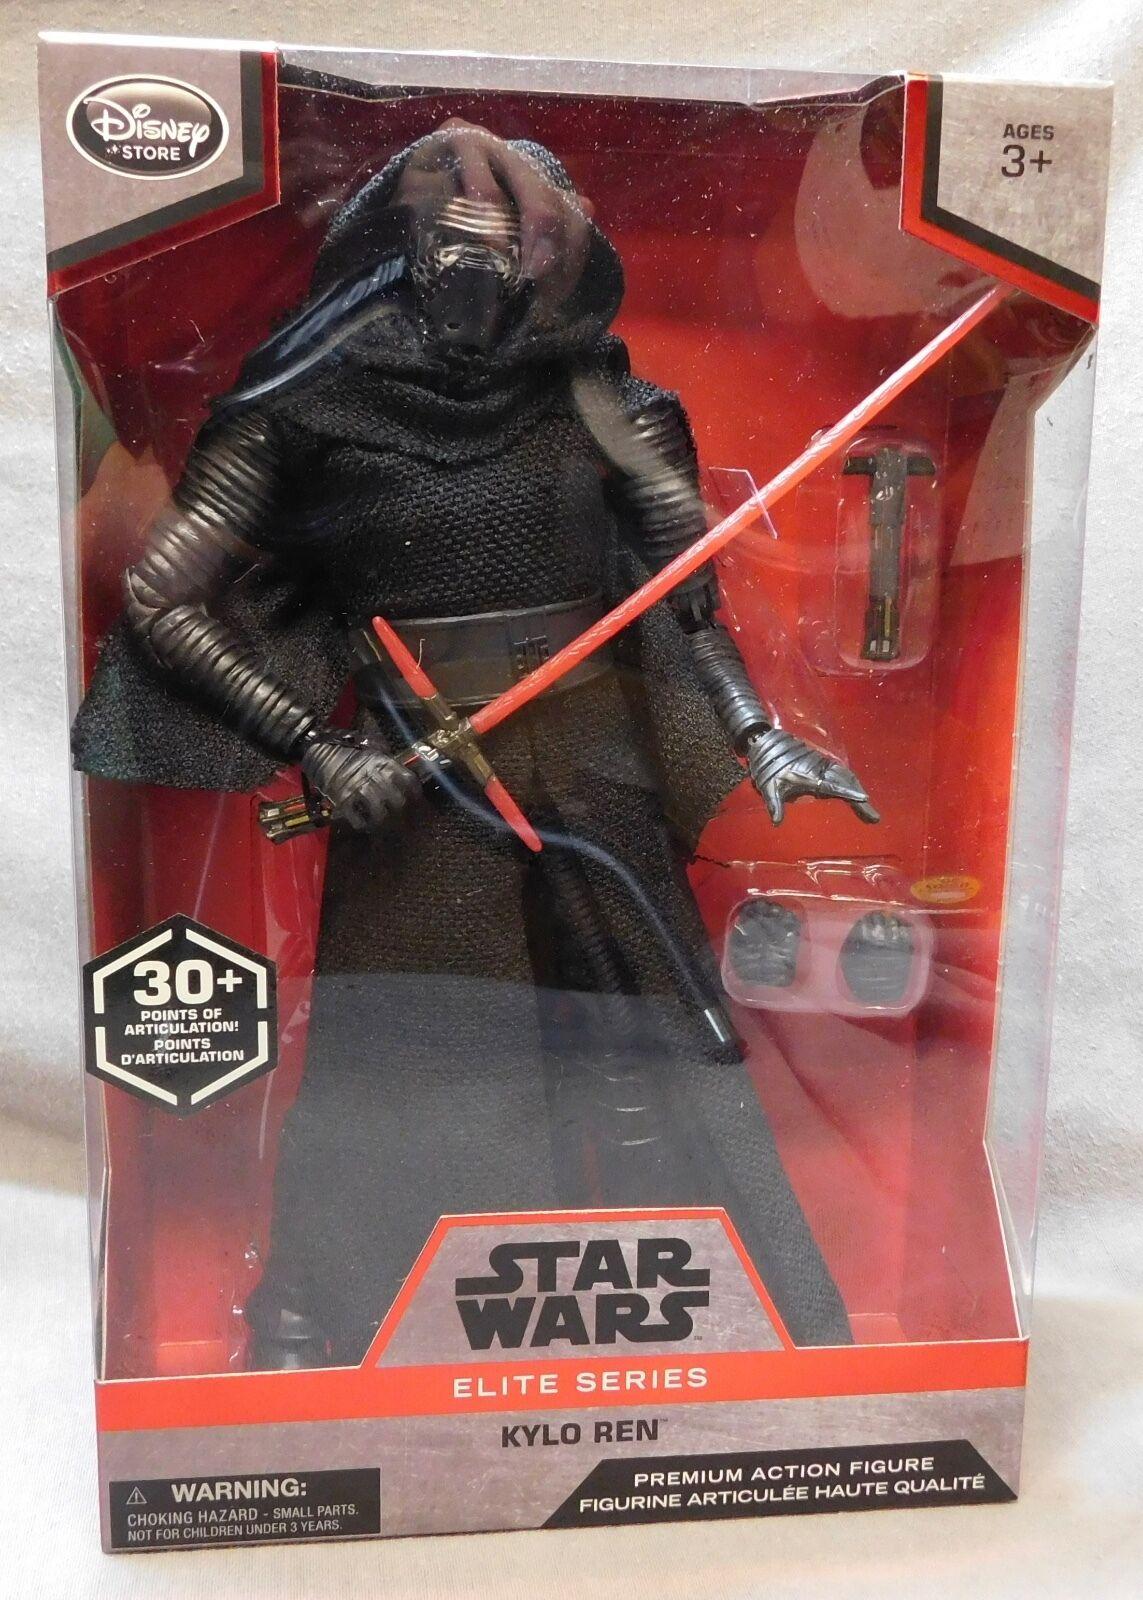 2016 Star Wars The Force Awakens Elite Series Kylo Ren Premium 10  Action Figure